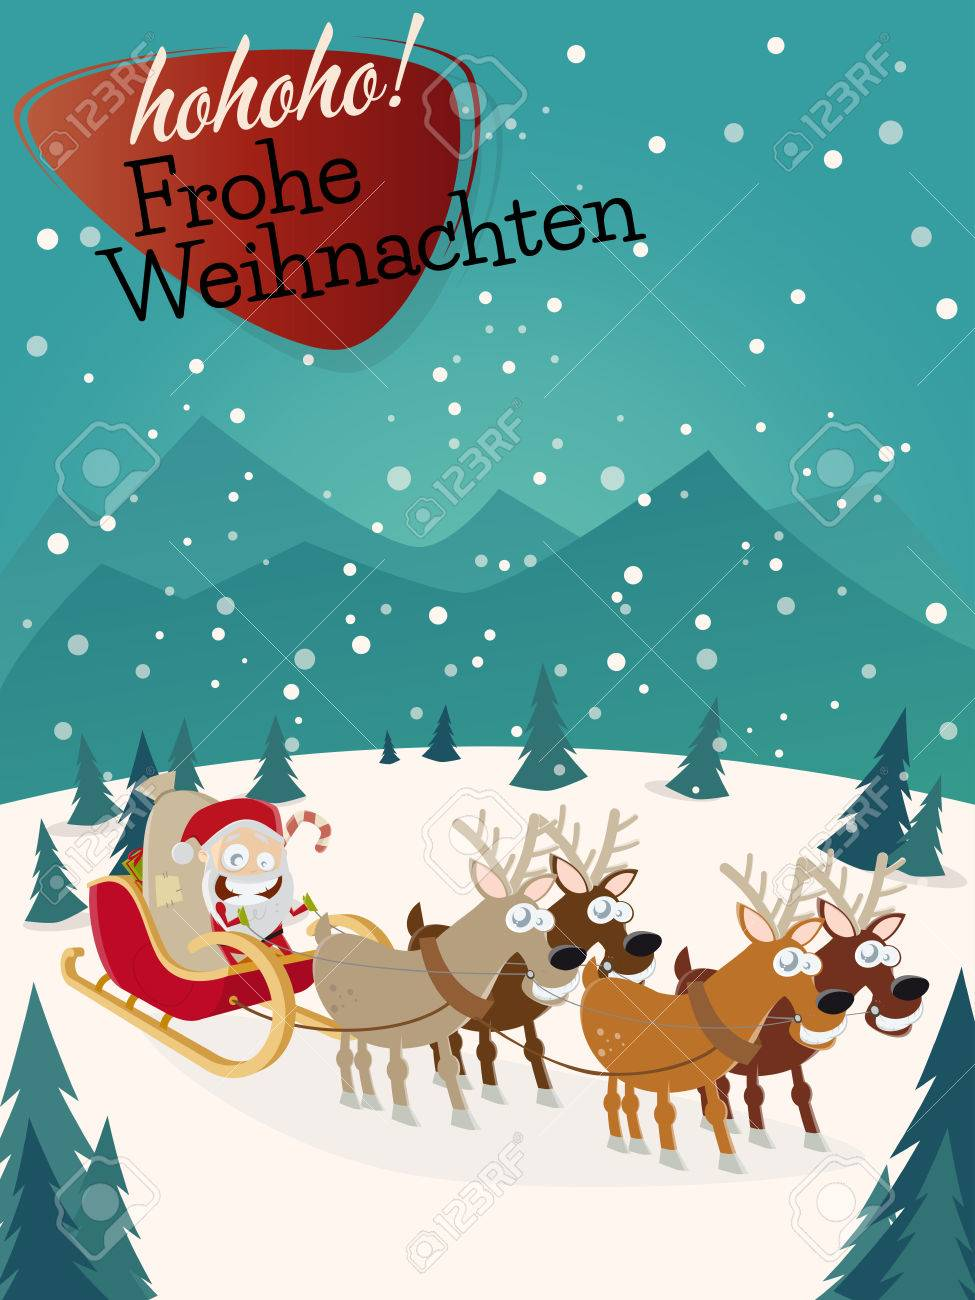 Weihnachtsgrüße Männer.Stock Photo